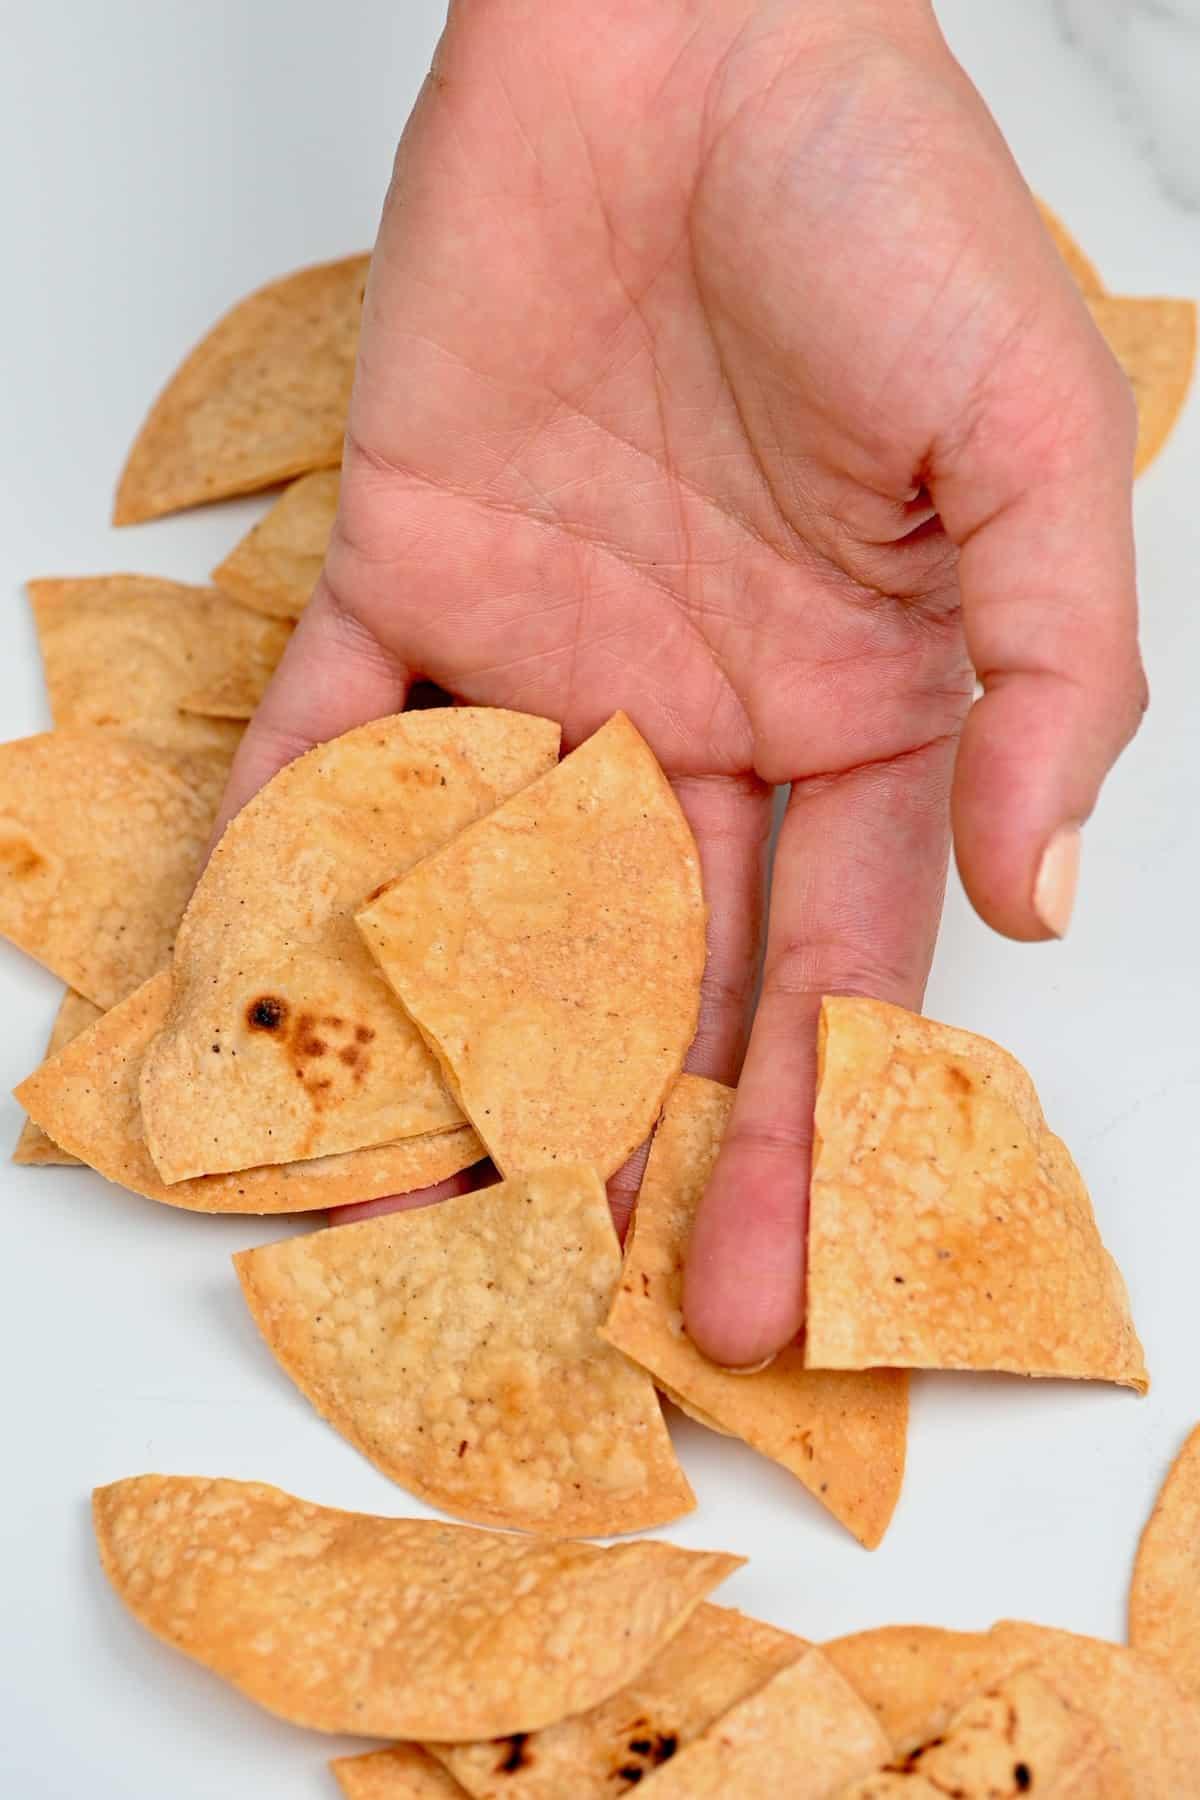 Hand holding corn tortilla chips